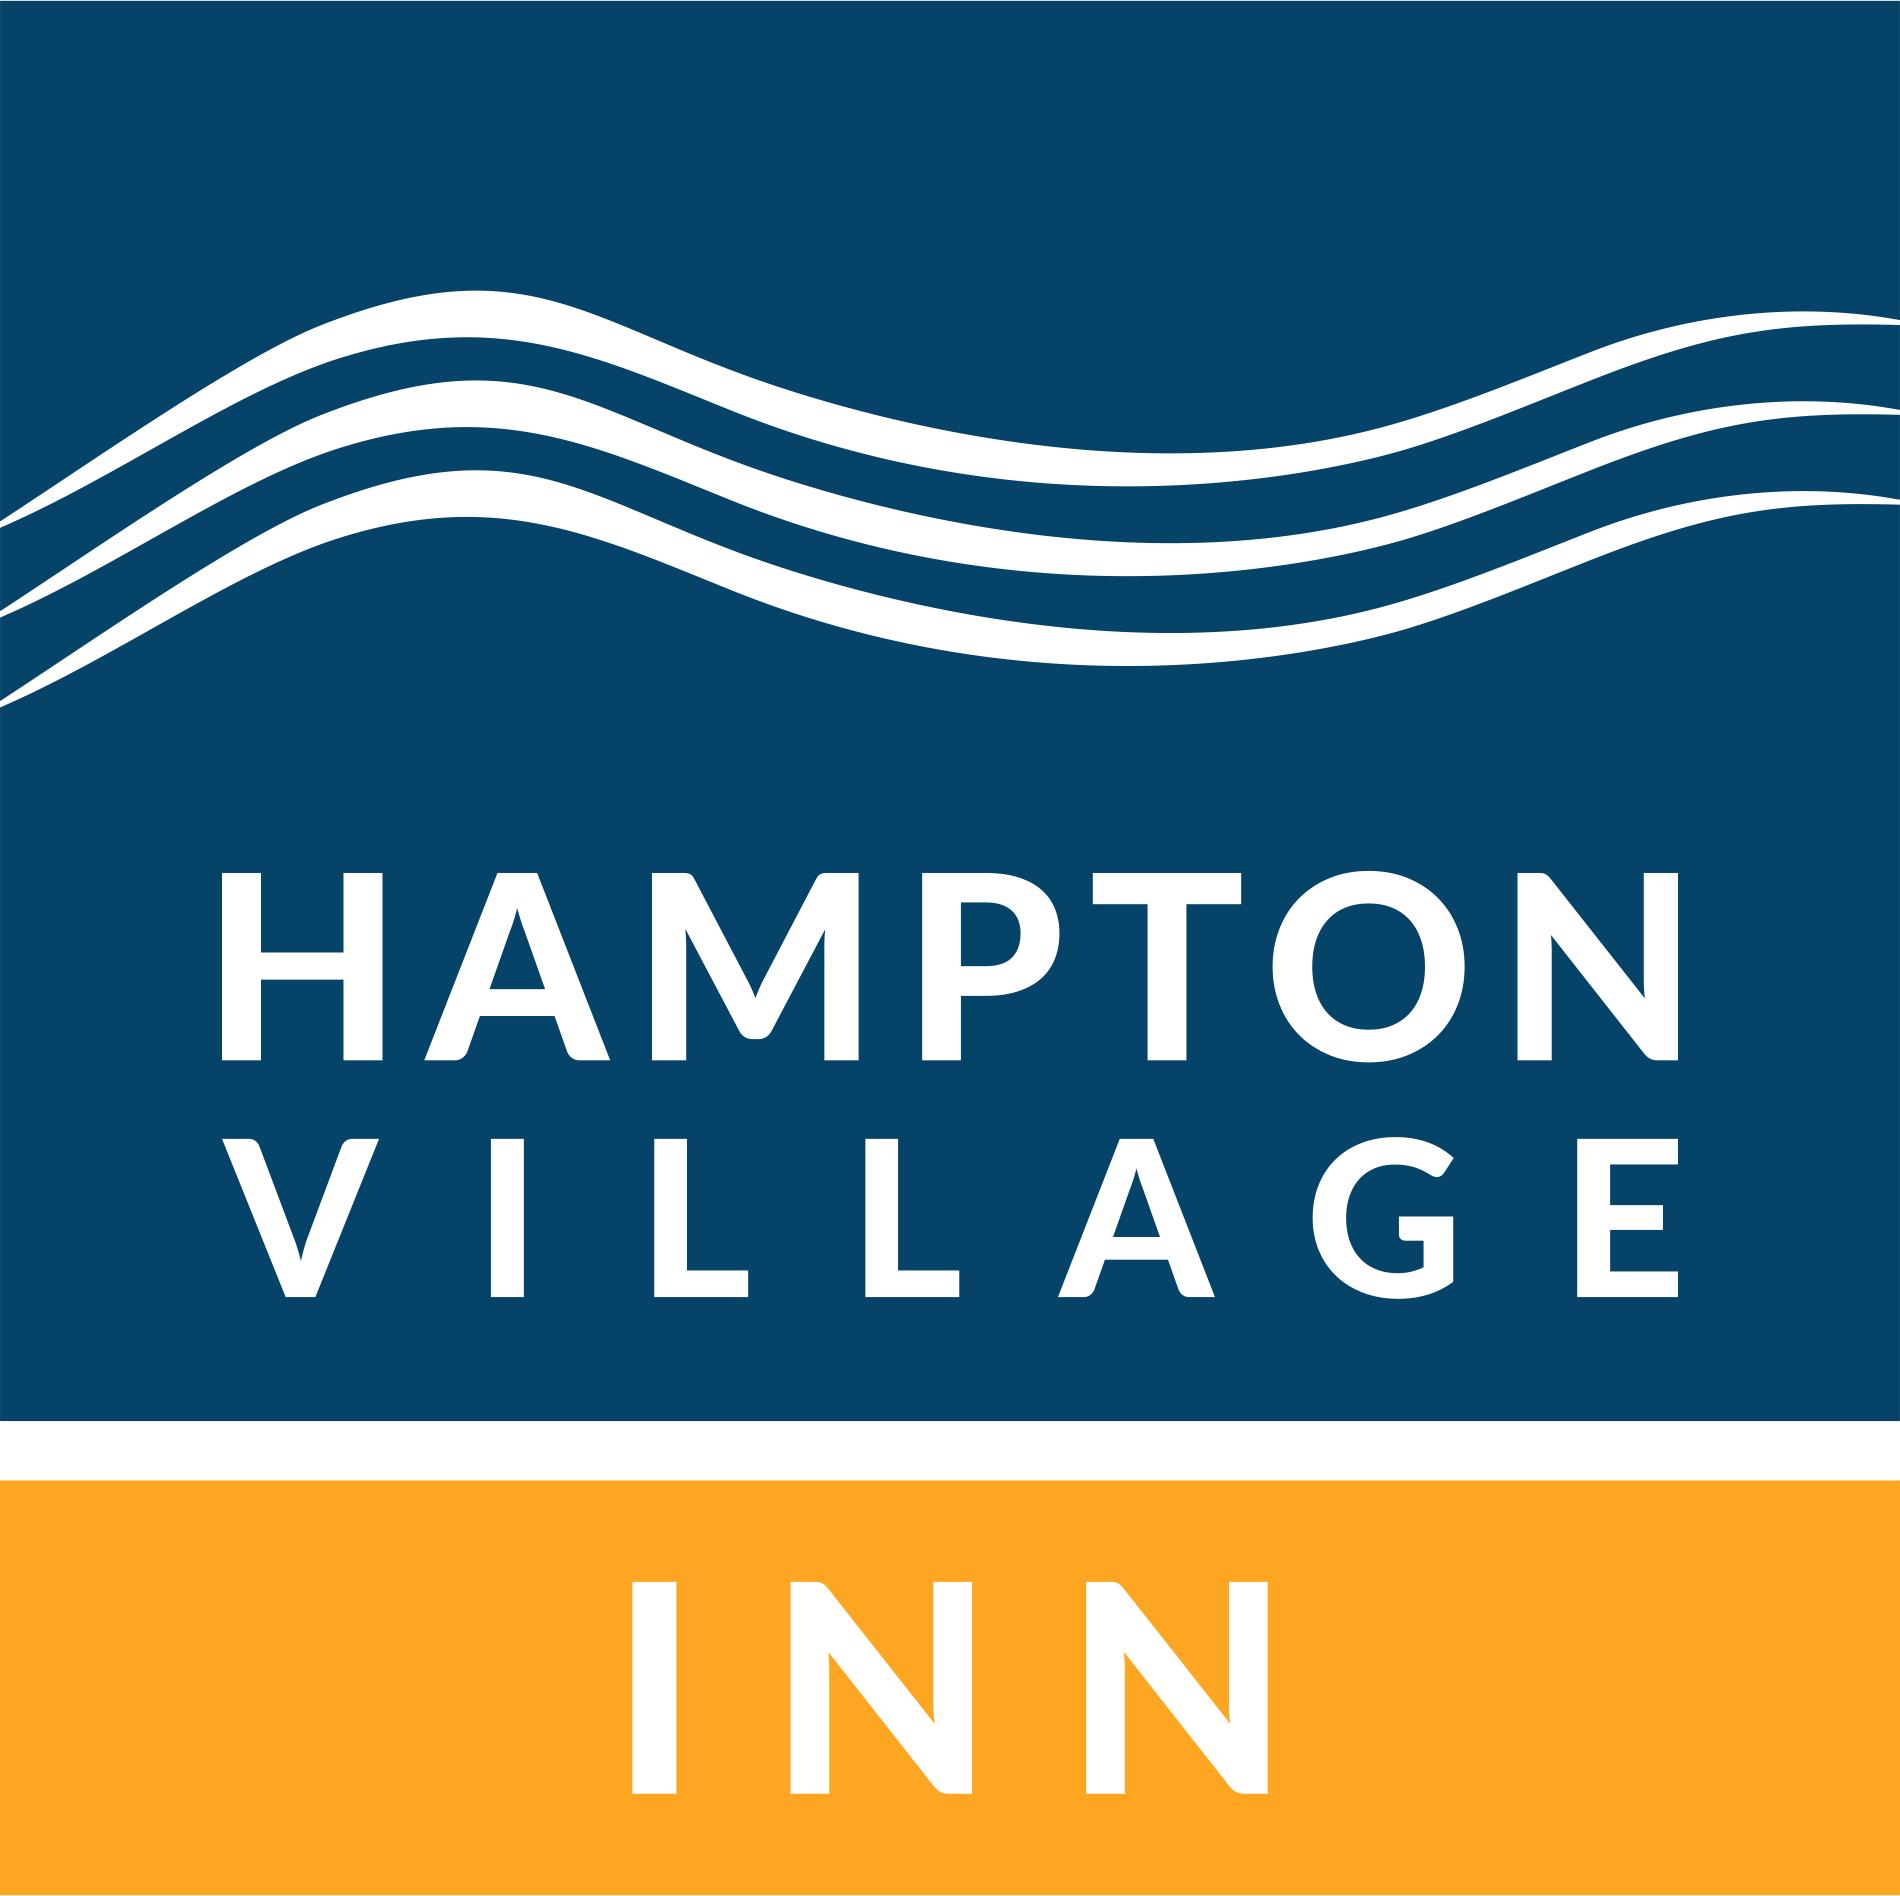 Hampton Village Inn